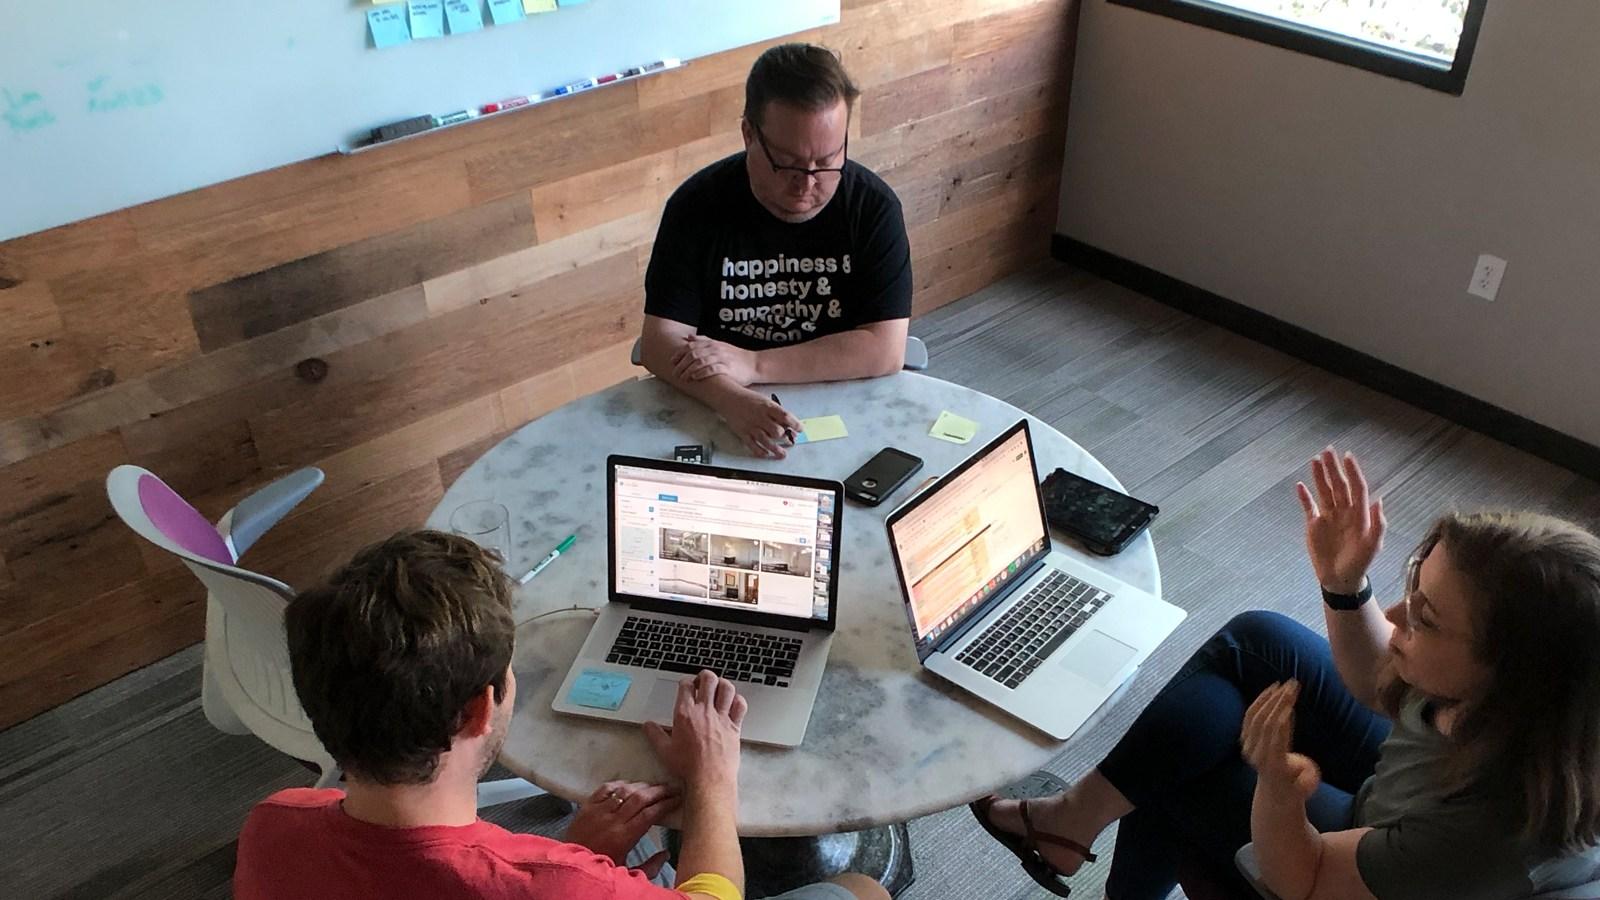 user testing session at Rocksauce